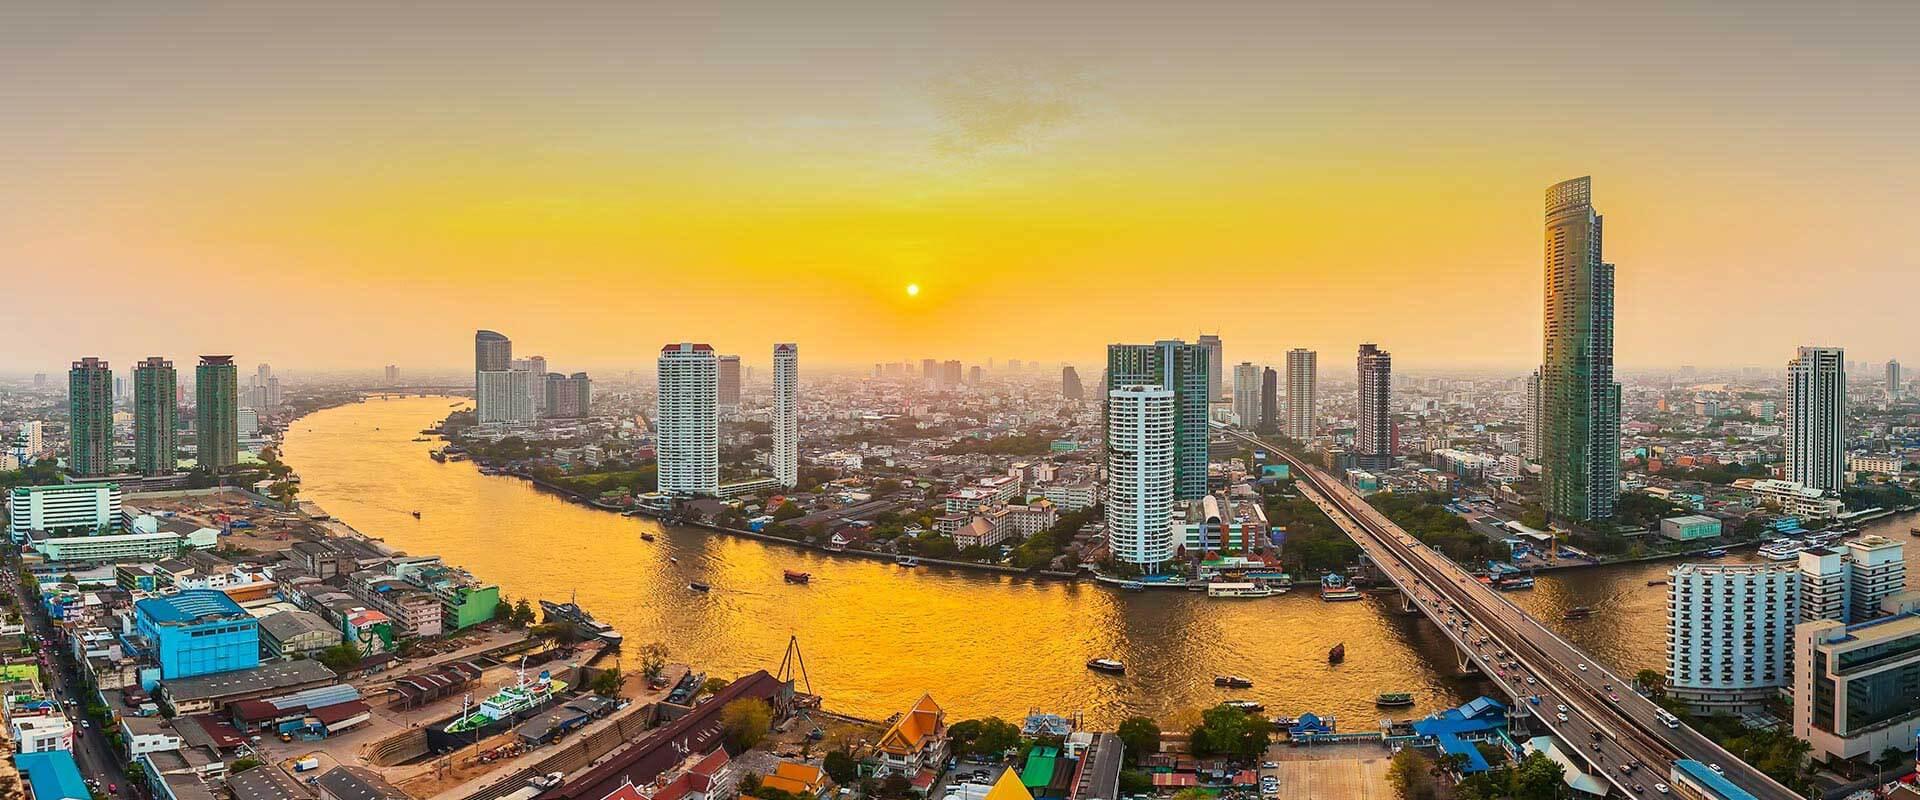 Vuelos baratos a Bangkok desde Buenos Aires por ARS 40.491 finales